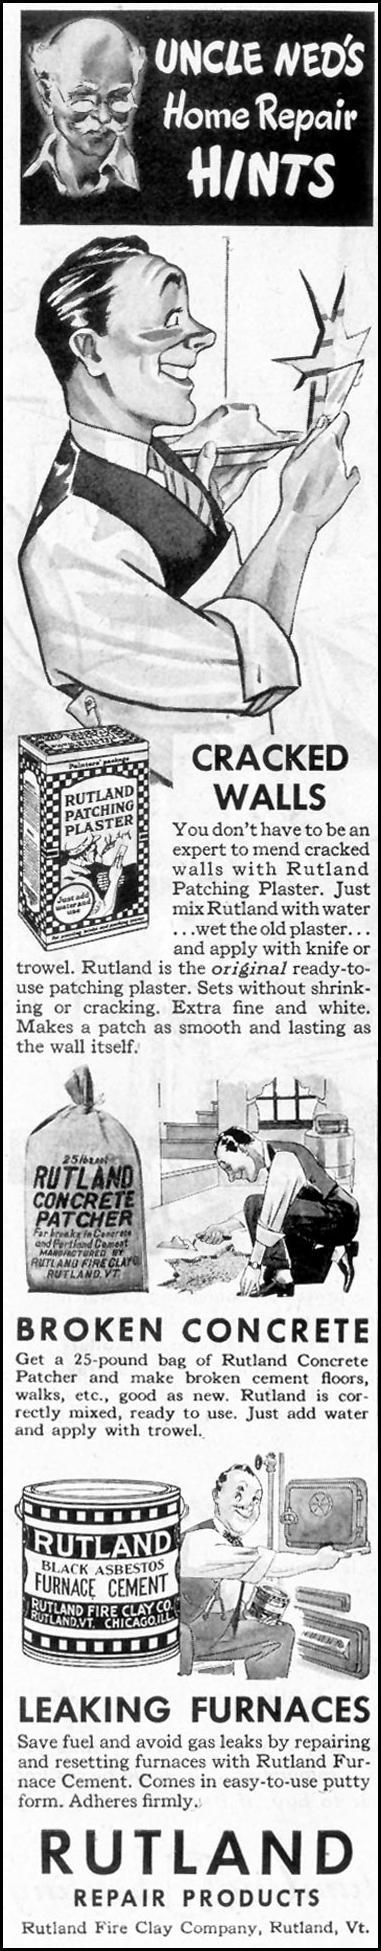 RUTLAND REPAIR PRODUCTS SATURDAY EVENING POST 05/19/1945 p. 70